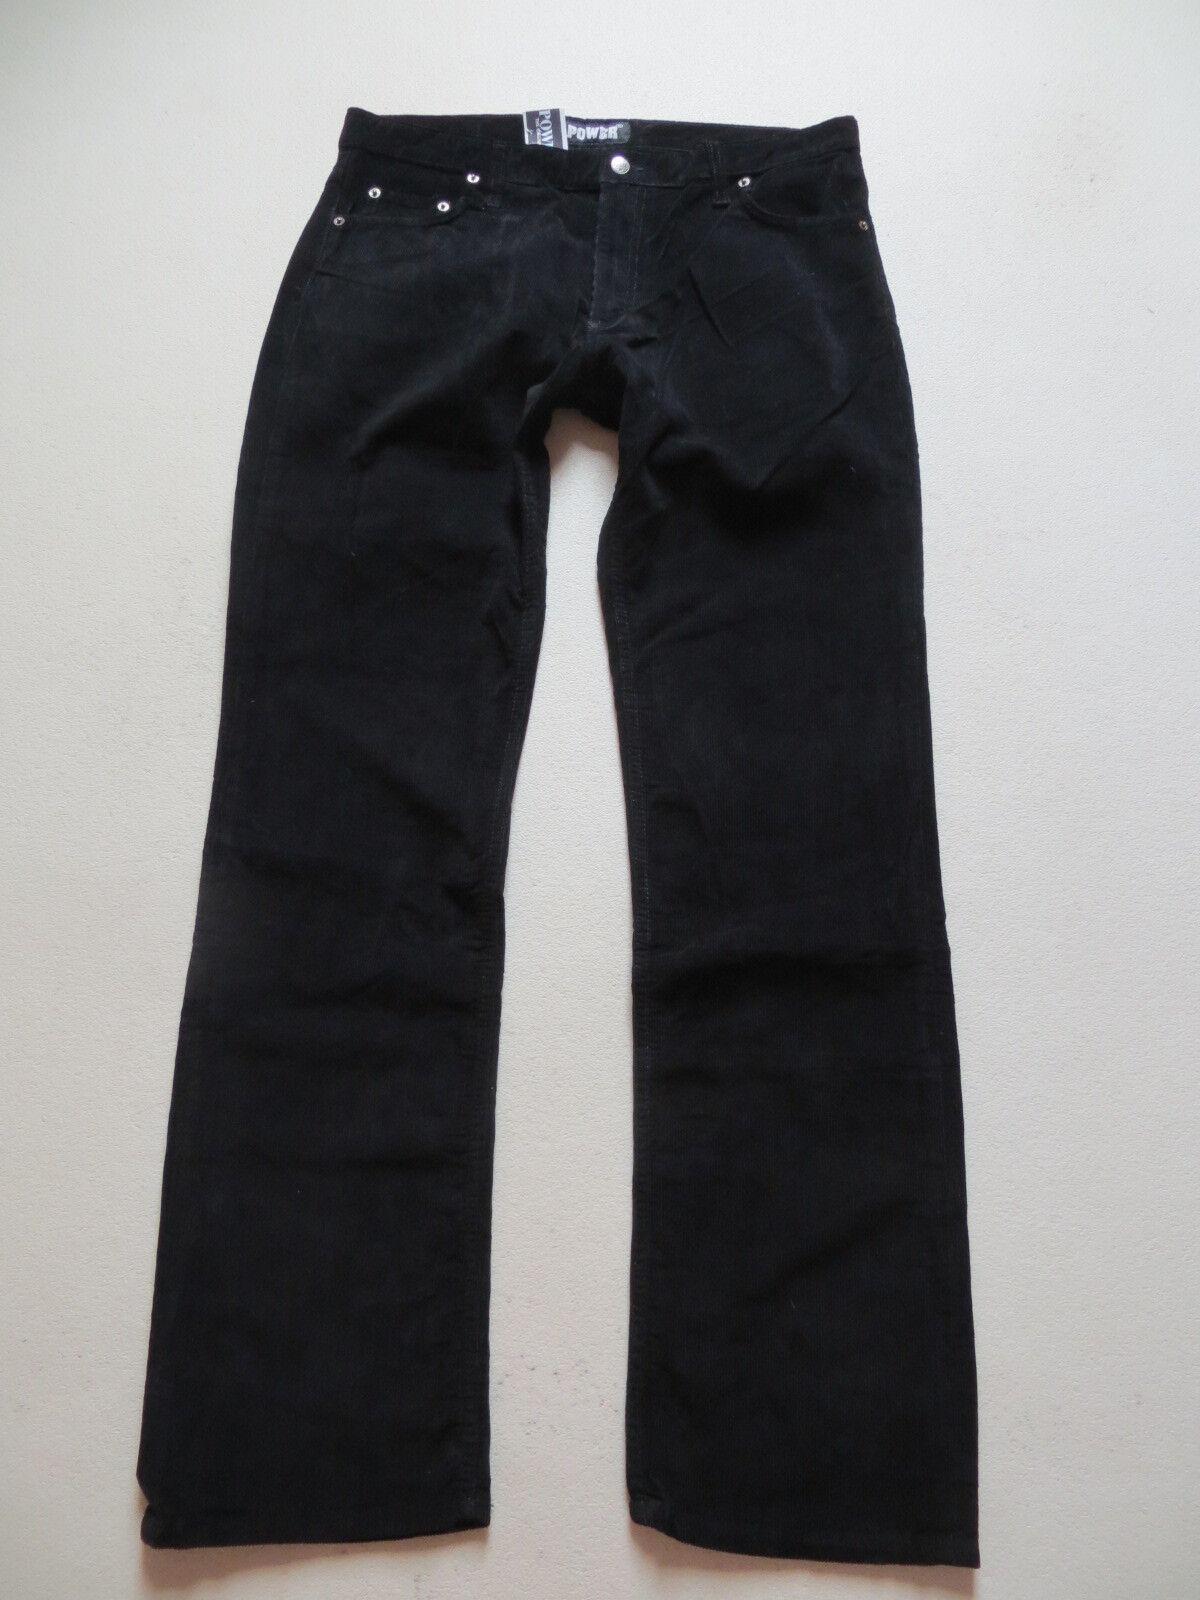 Original POWER Cord Jeans Hose, W 32  L 30, black   NEU   Model 921 Cordhose